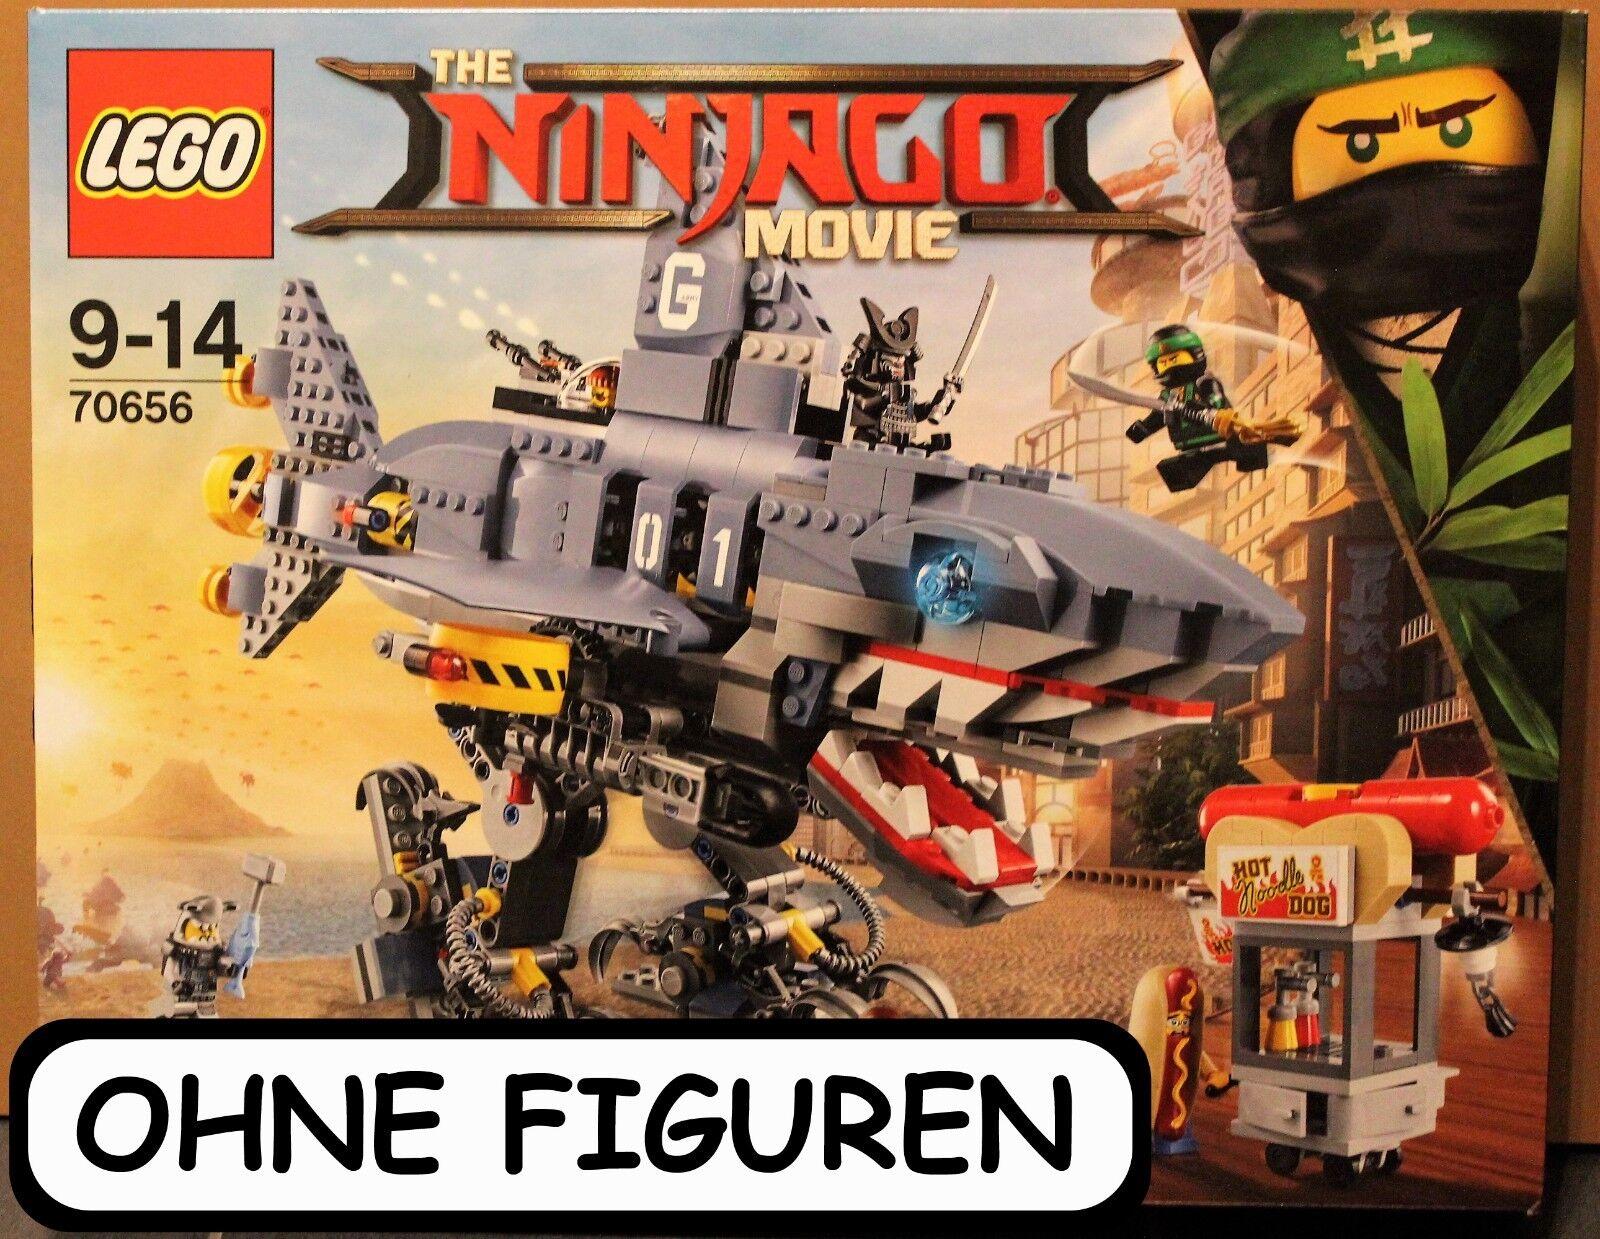 LEGO ® NINJAGO MOVIE GARMADON     SET 70656   OHNE FIGUREN   NEUWERTIG